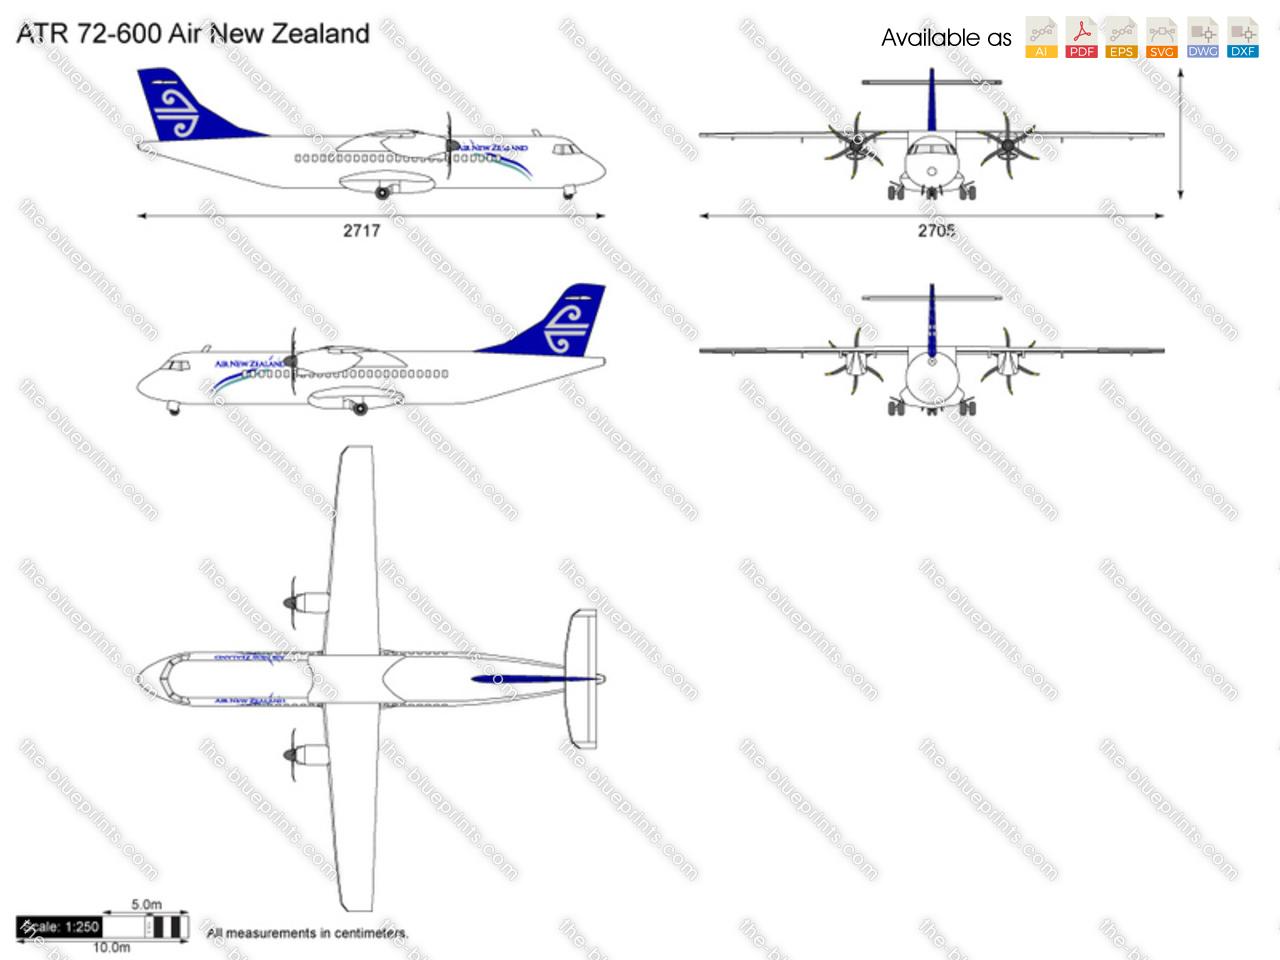 ATR 600 Air New Zealand